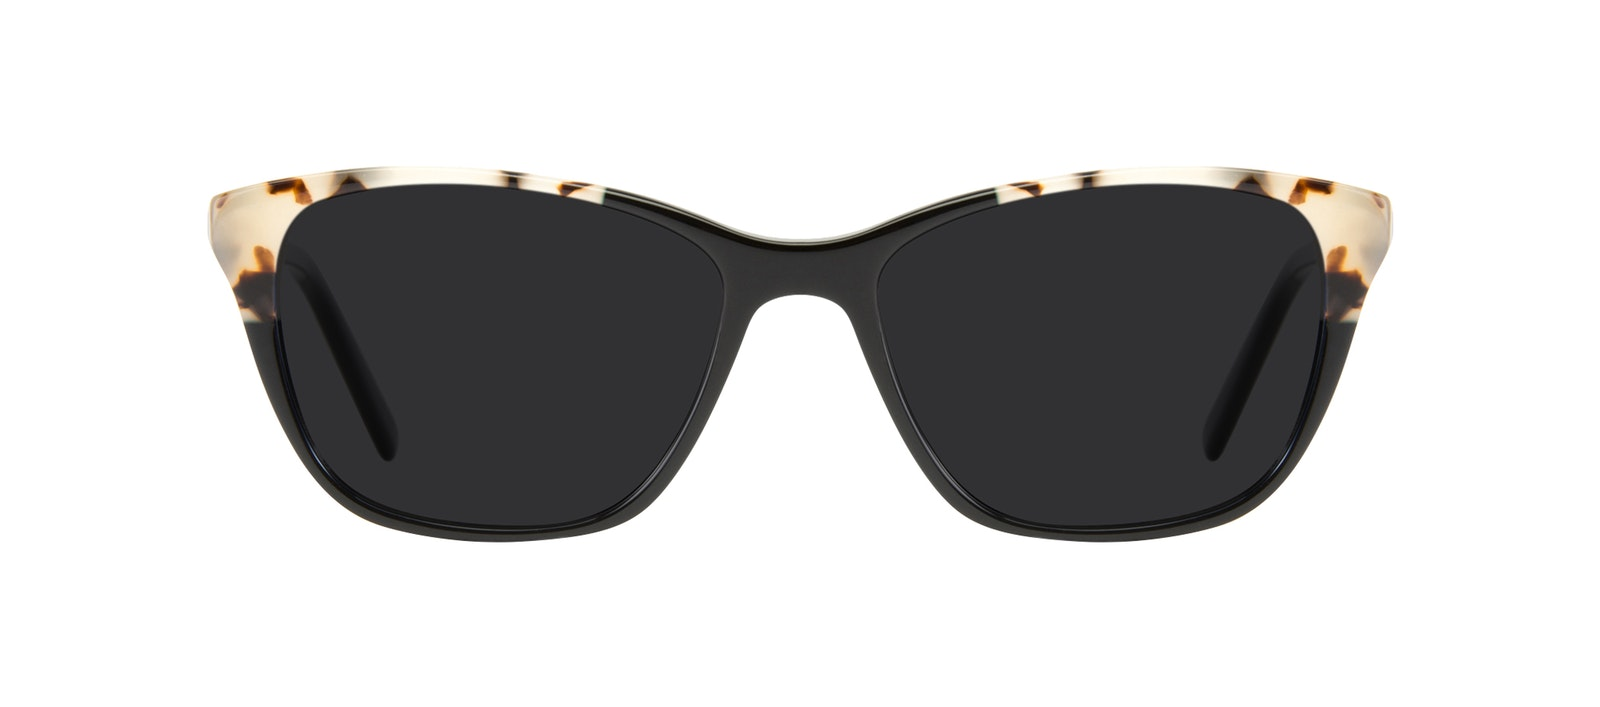 Affordable Fashion Glasses Cat Eye Sunglasses Women Myrtle Petite Ebony Granite Front